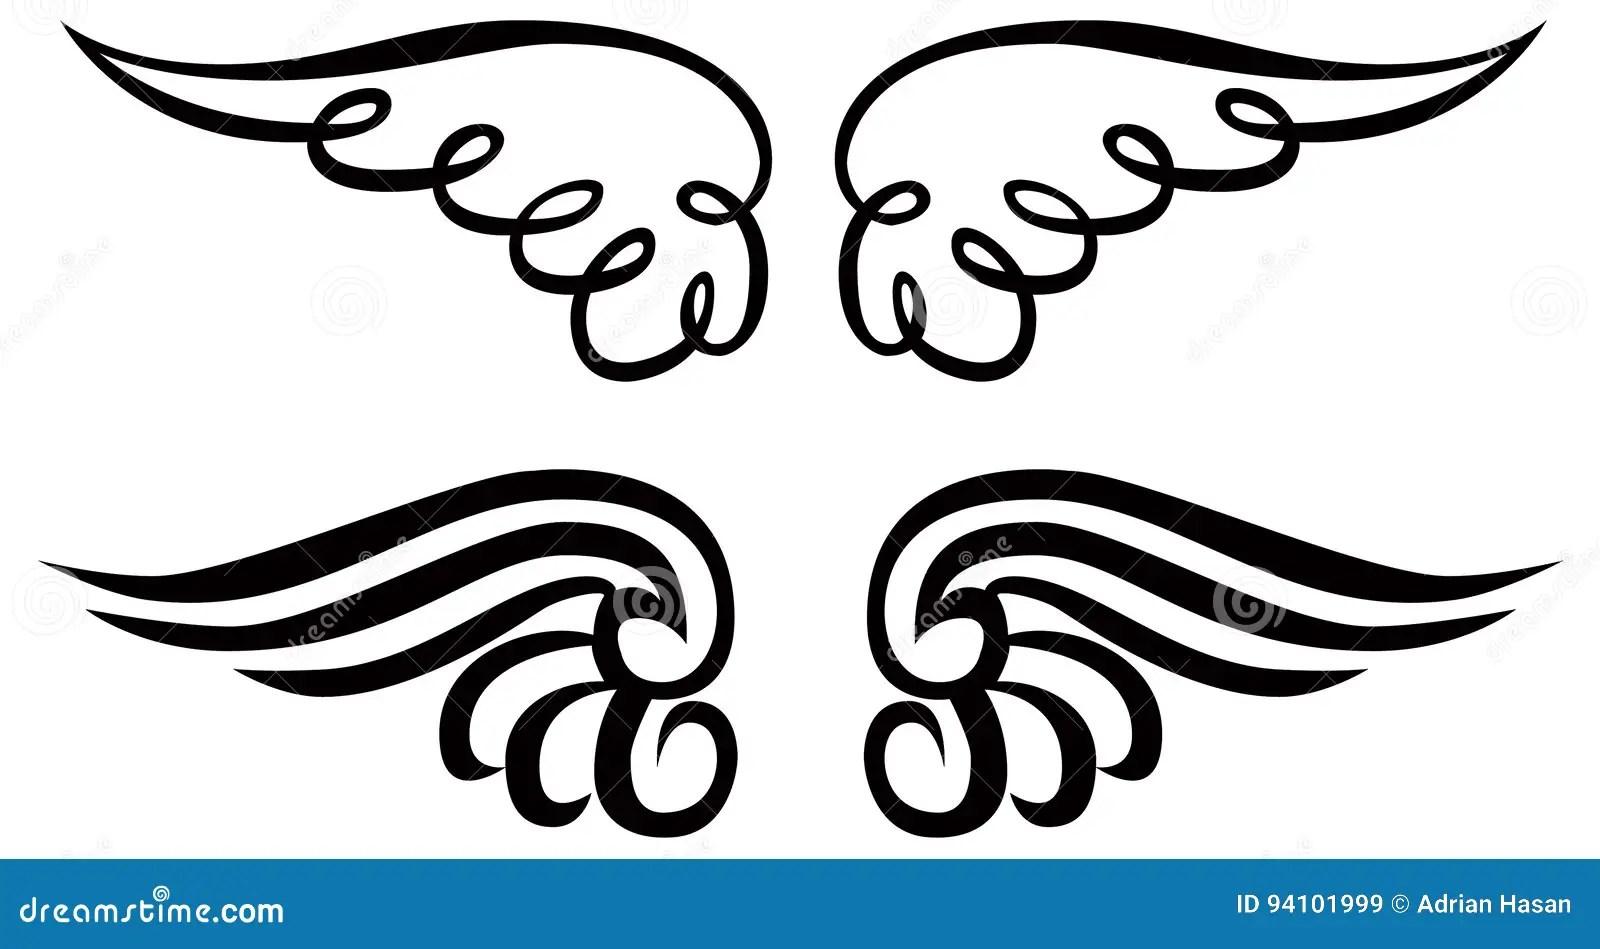 Angel Wings Ornament Clip Art Vector Line Art Stock